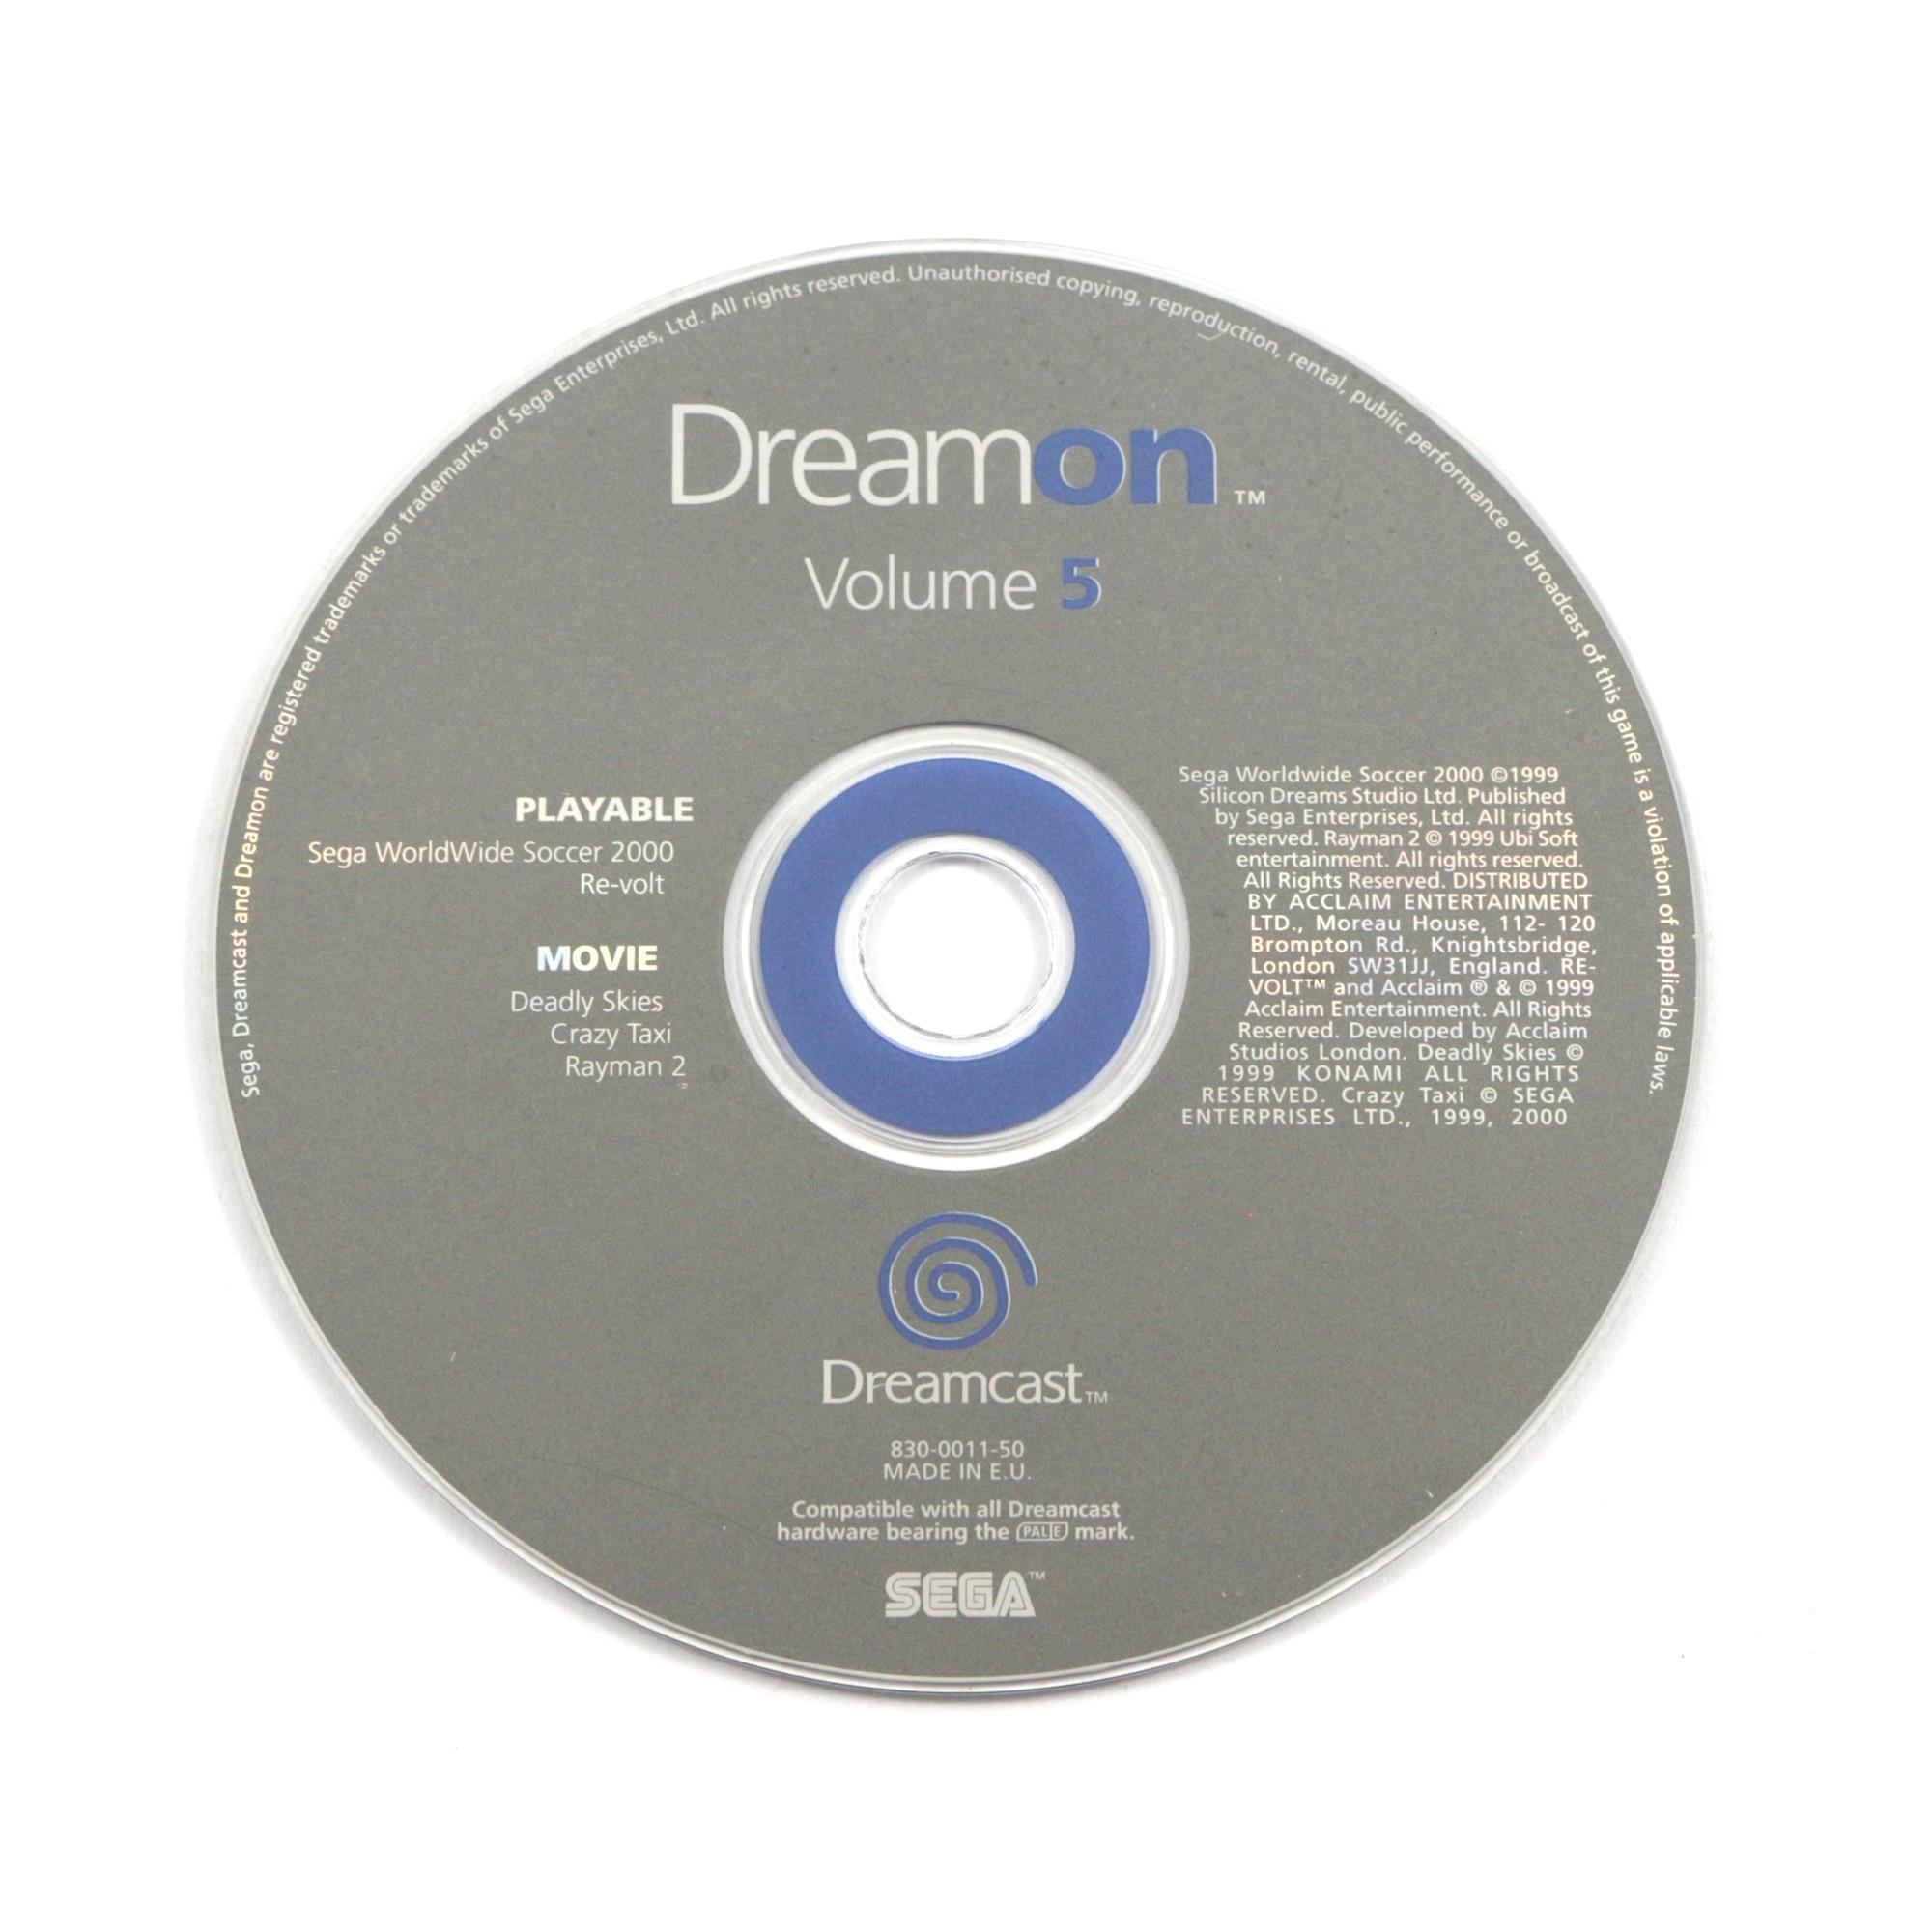 Dreamon Vol. 5